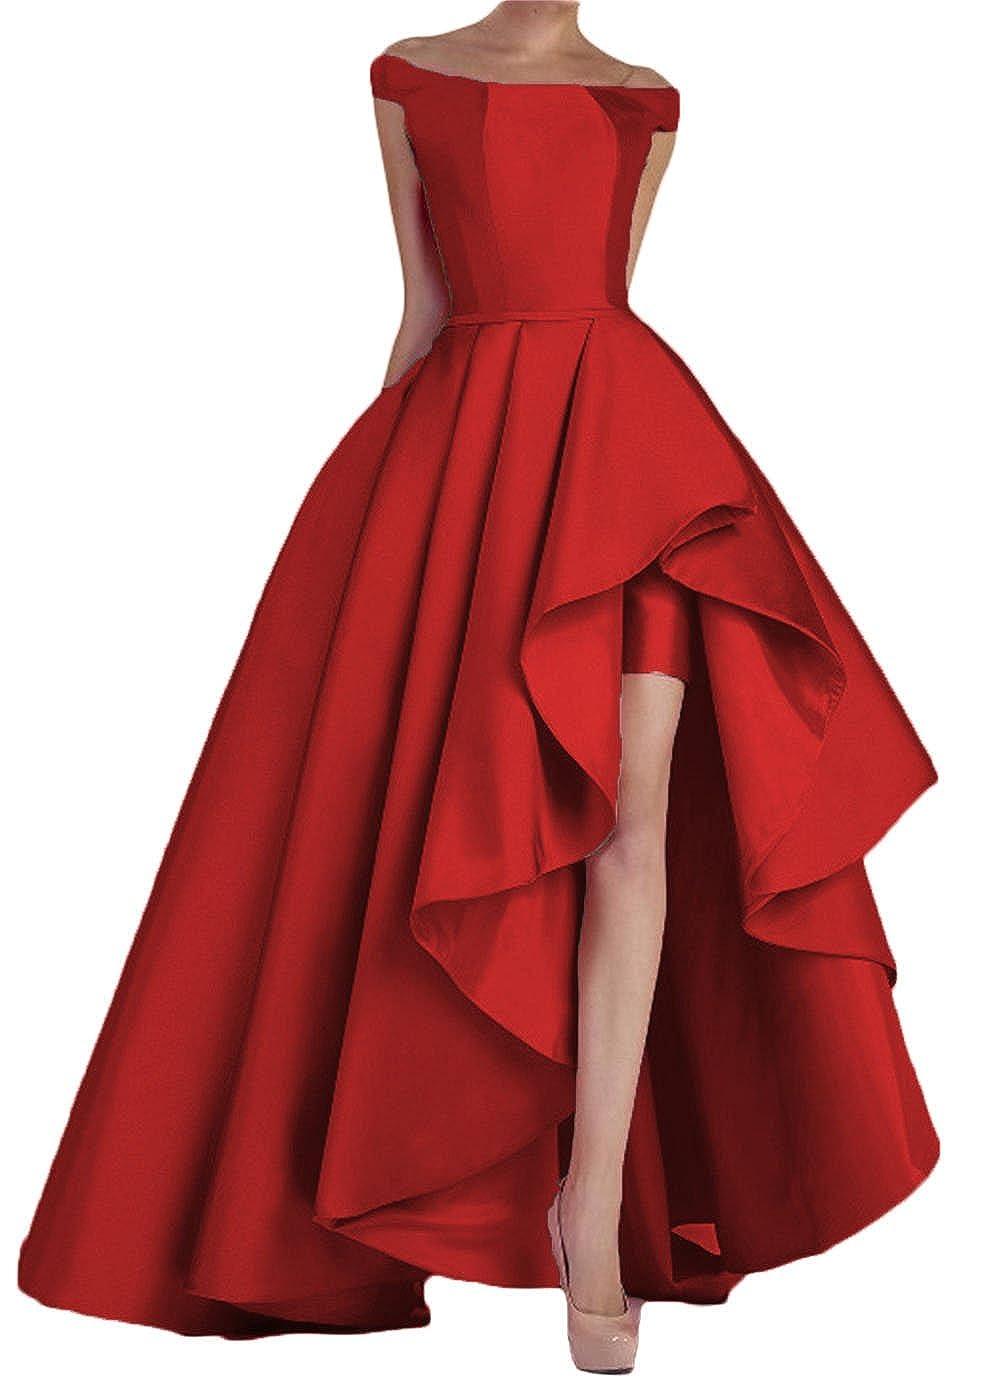 Dark Red Dydsz Women's Off Shoulder Long Evening Prom Dresses Plus Size Formal Gowns D22